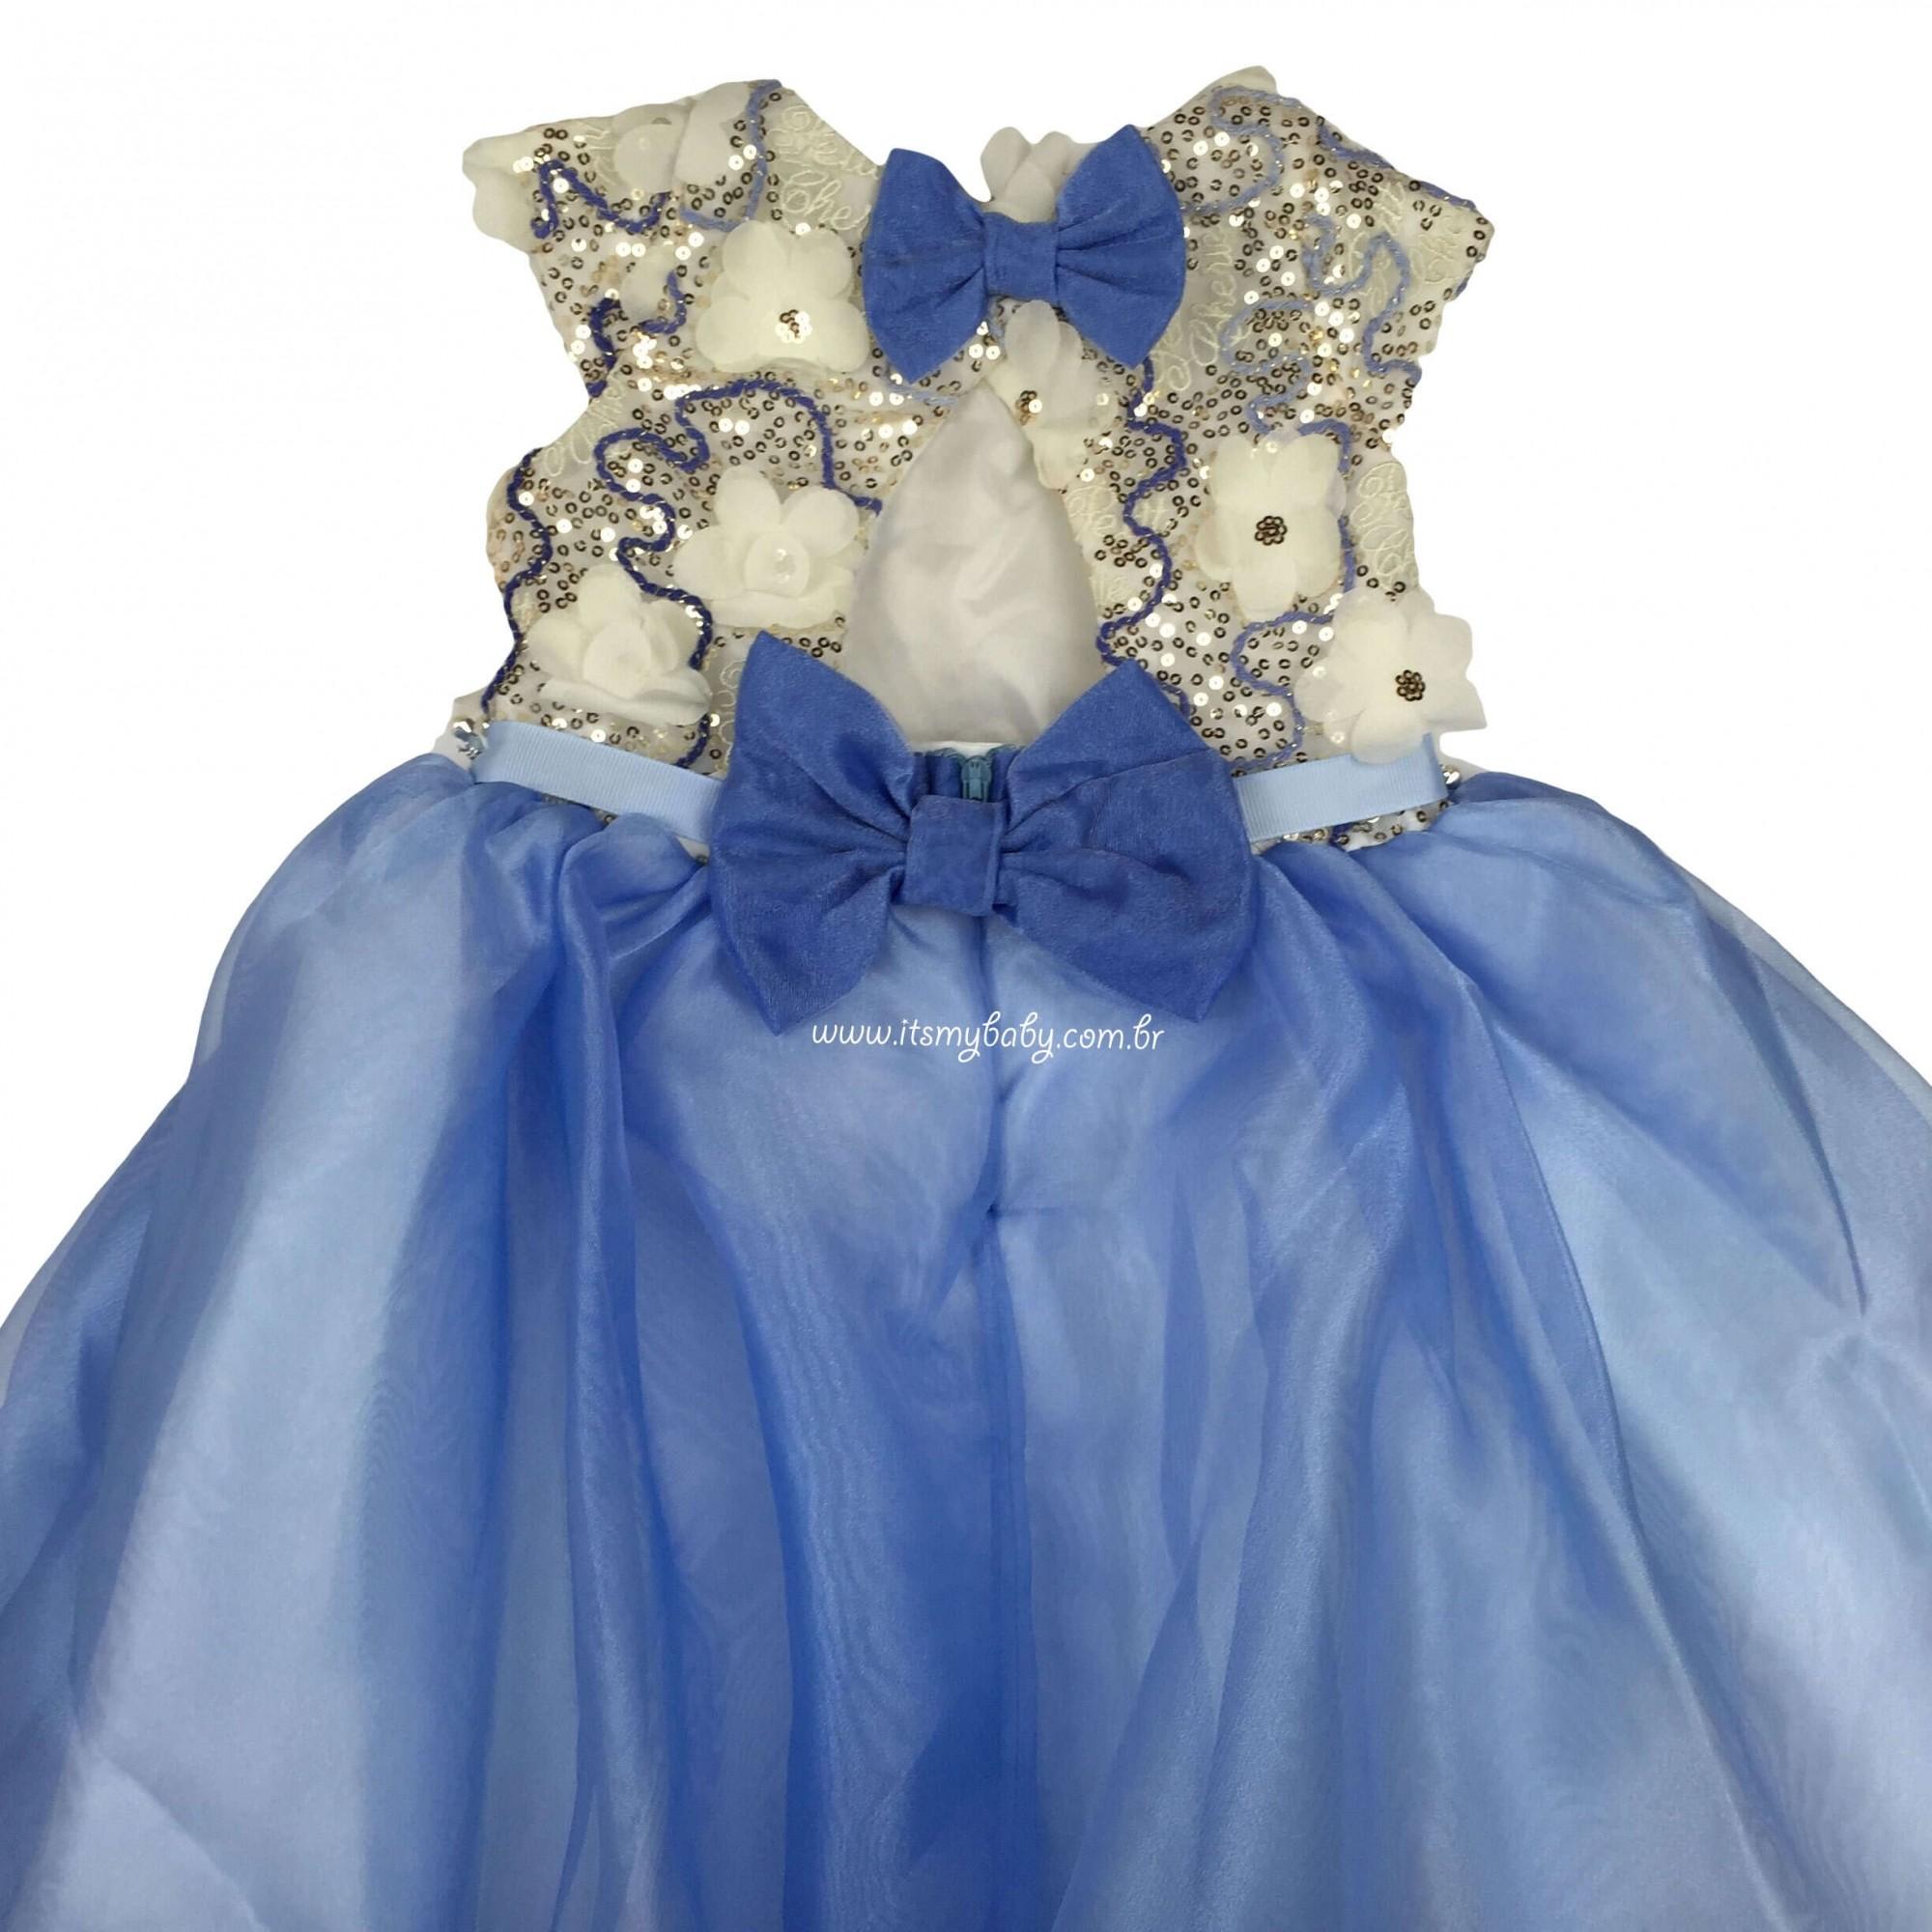 Vestido Festa Azul Bordado